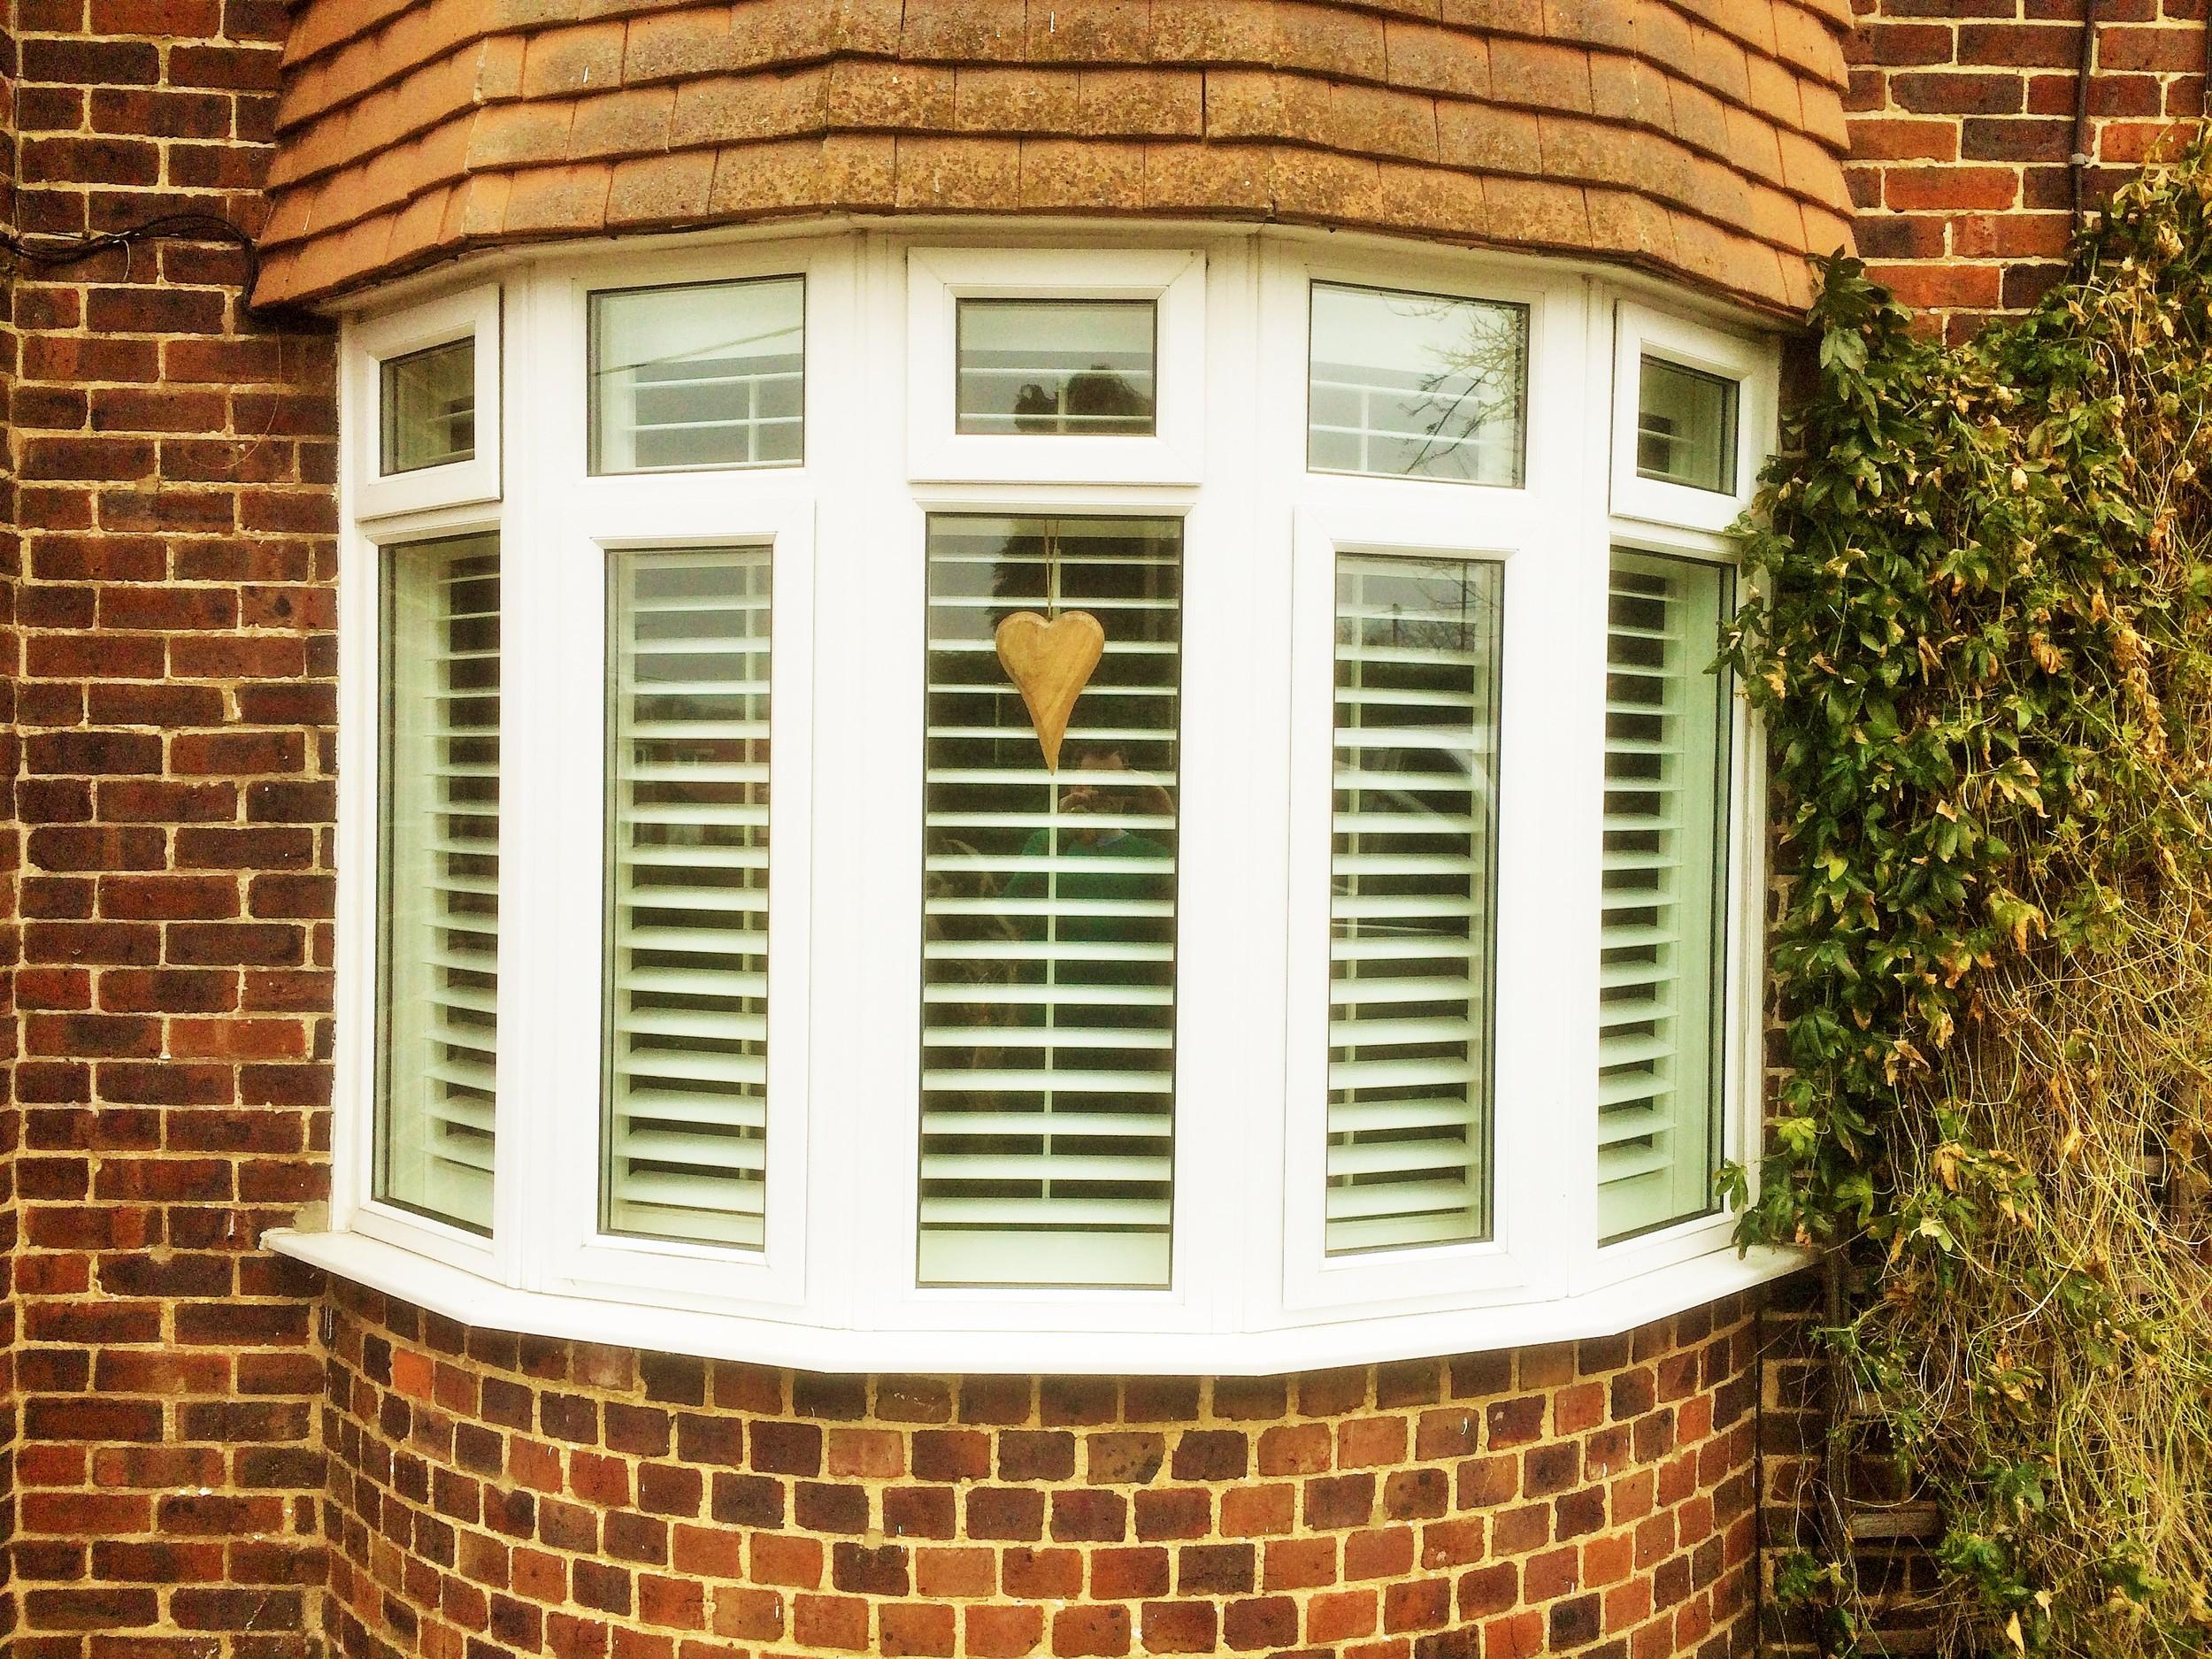 view-from-street-bow-window-with-plantation-shutters-ashvale-aldershot-£873.JPG